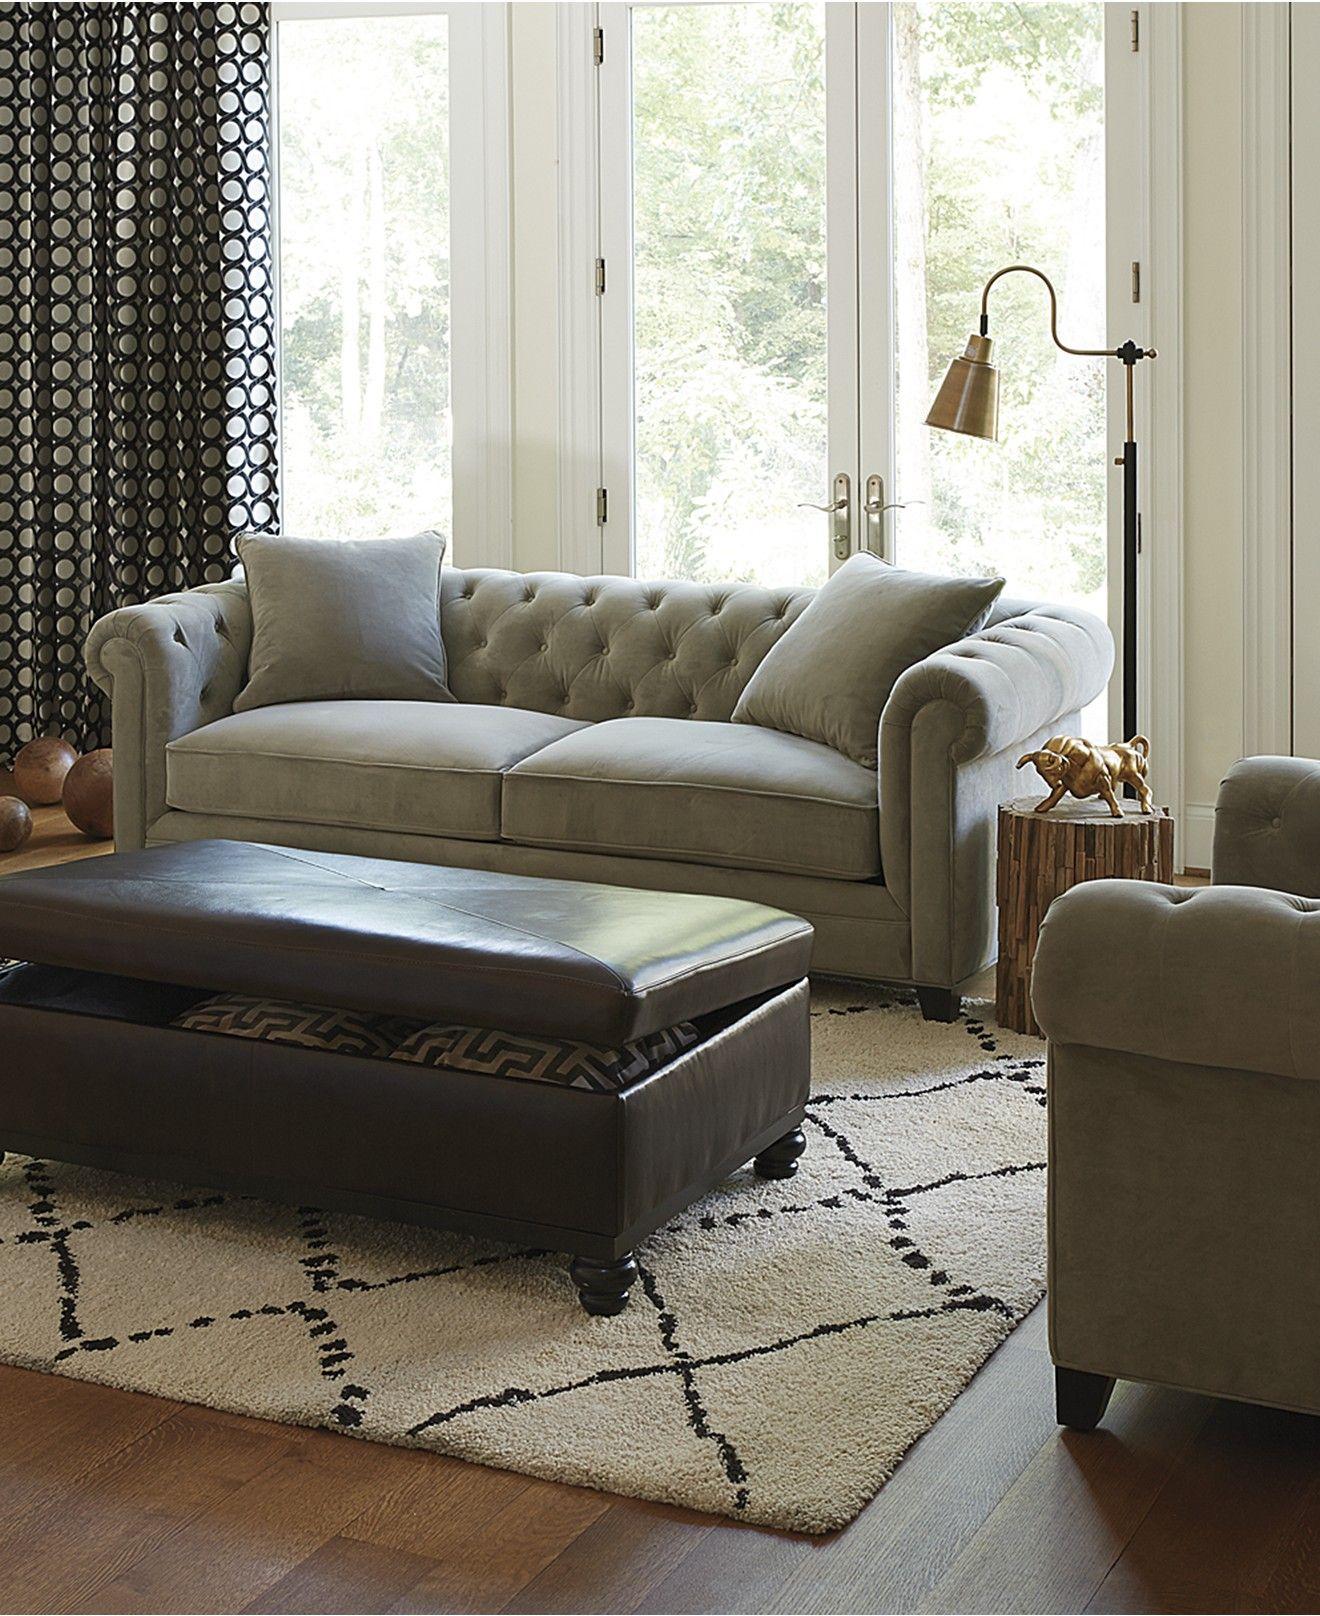 Saybridge 92 Fabric Sofa Created For Macy S New England